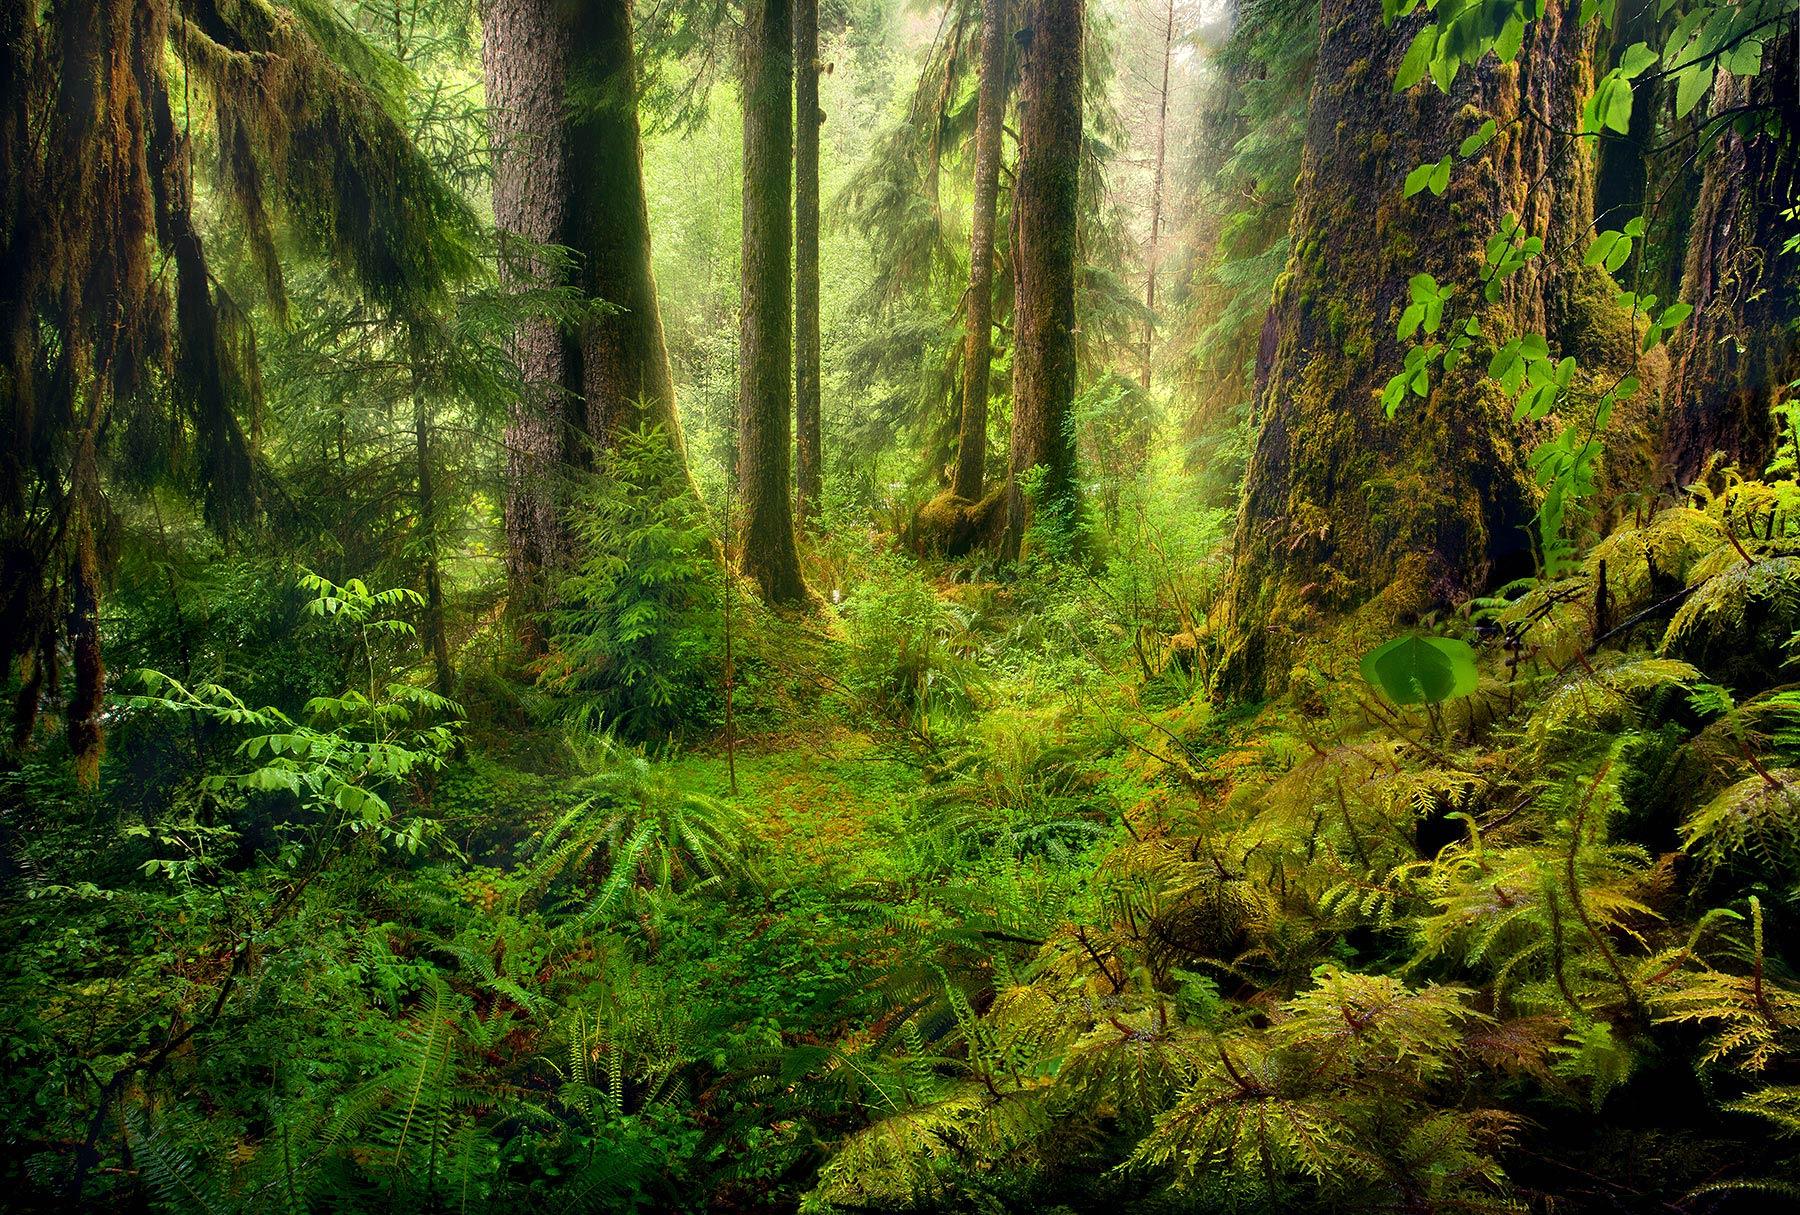 Misty, rainy, olympic, rainforest, photo